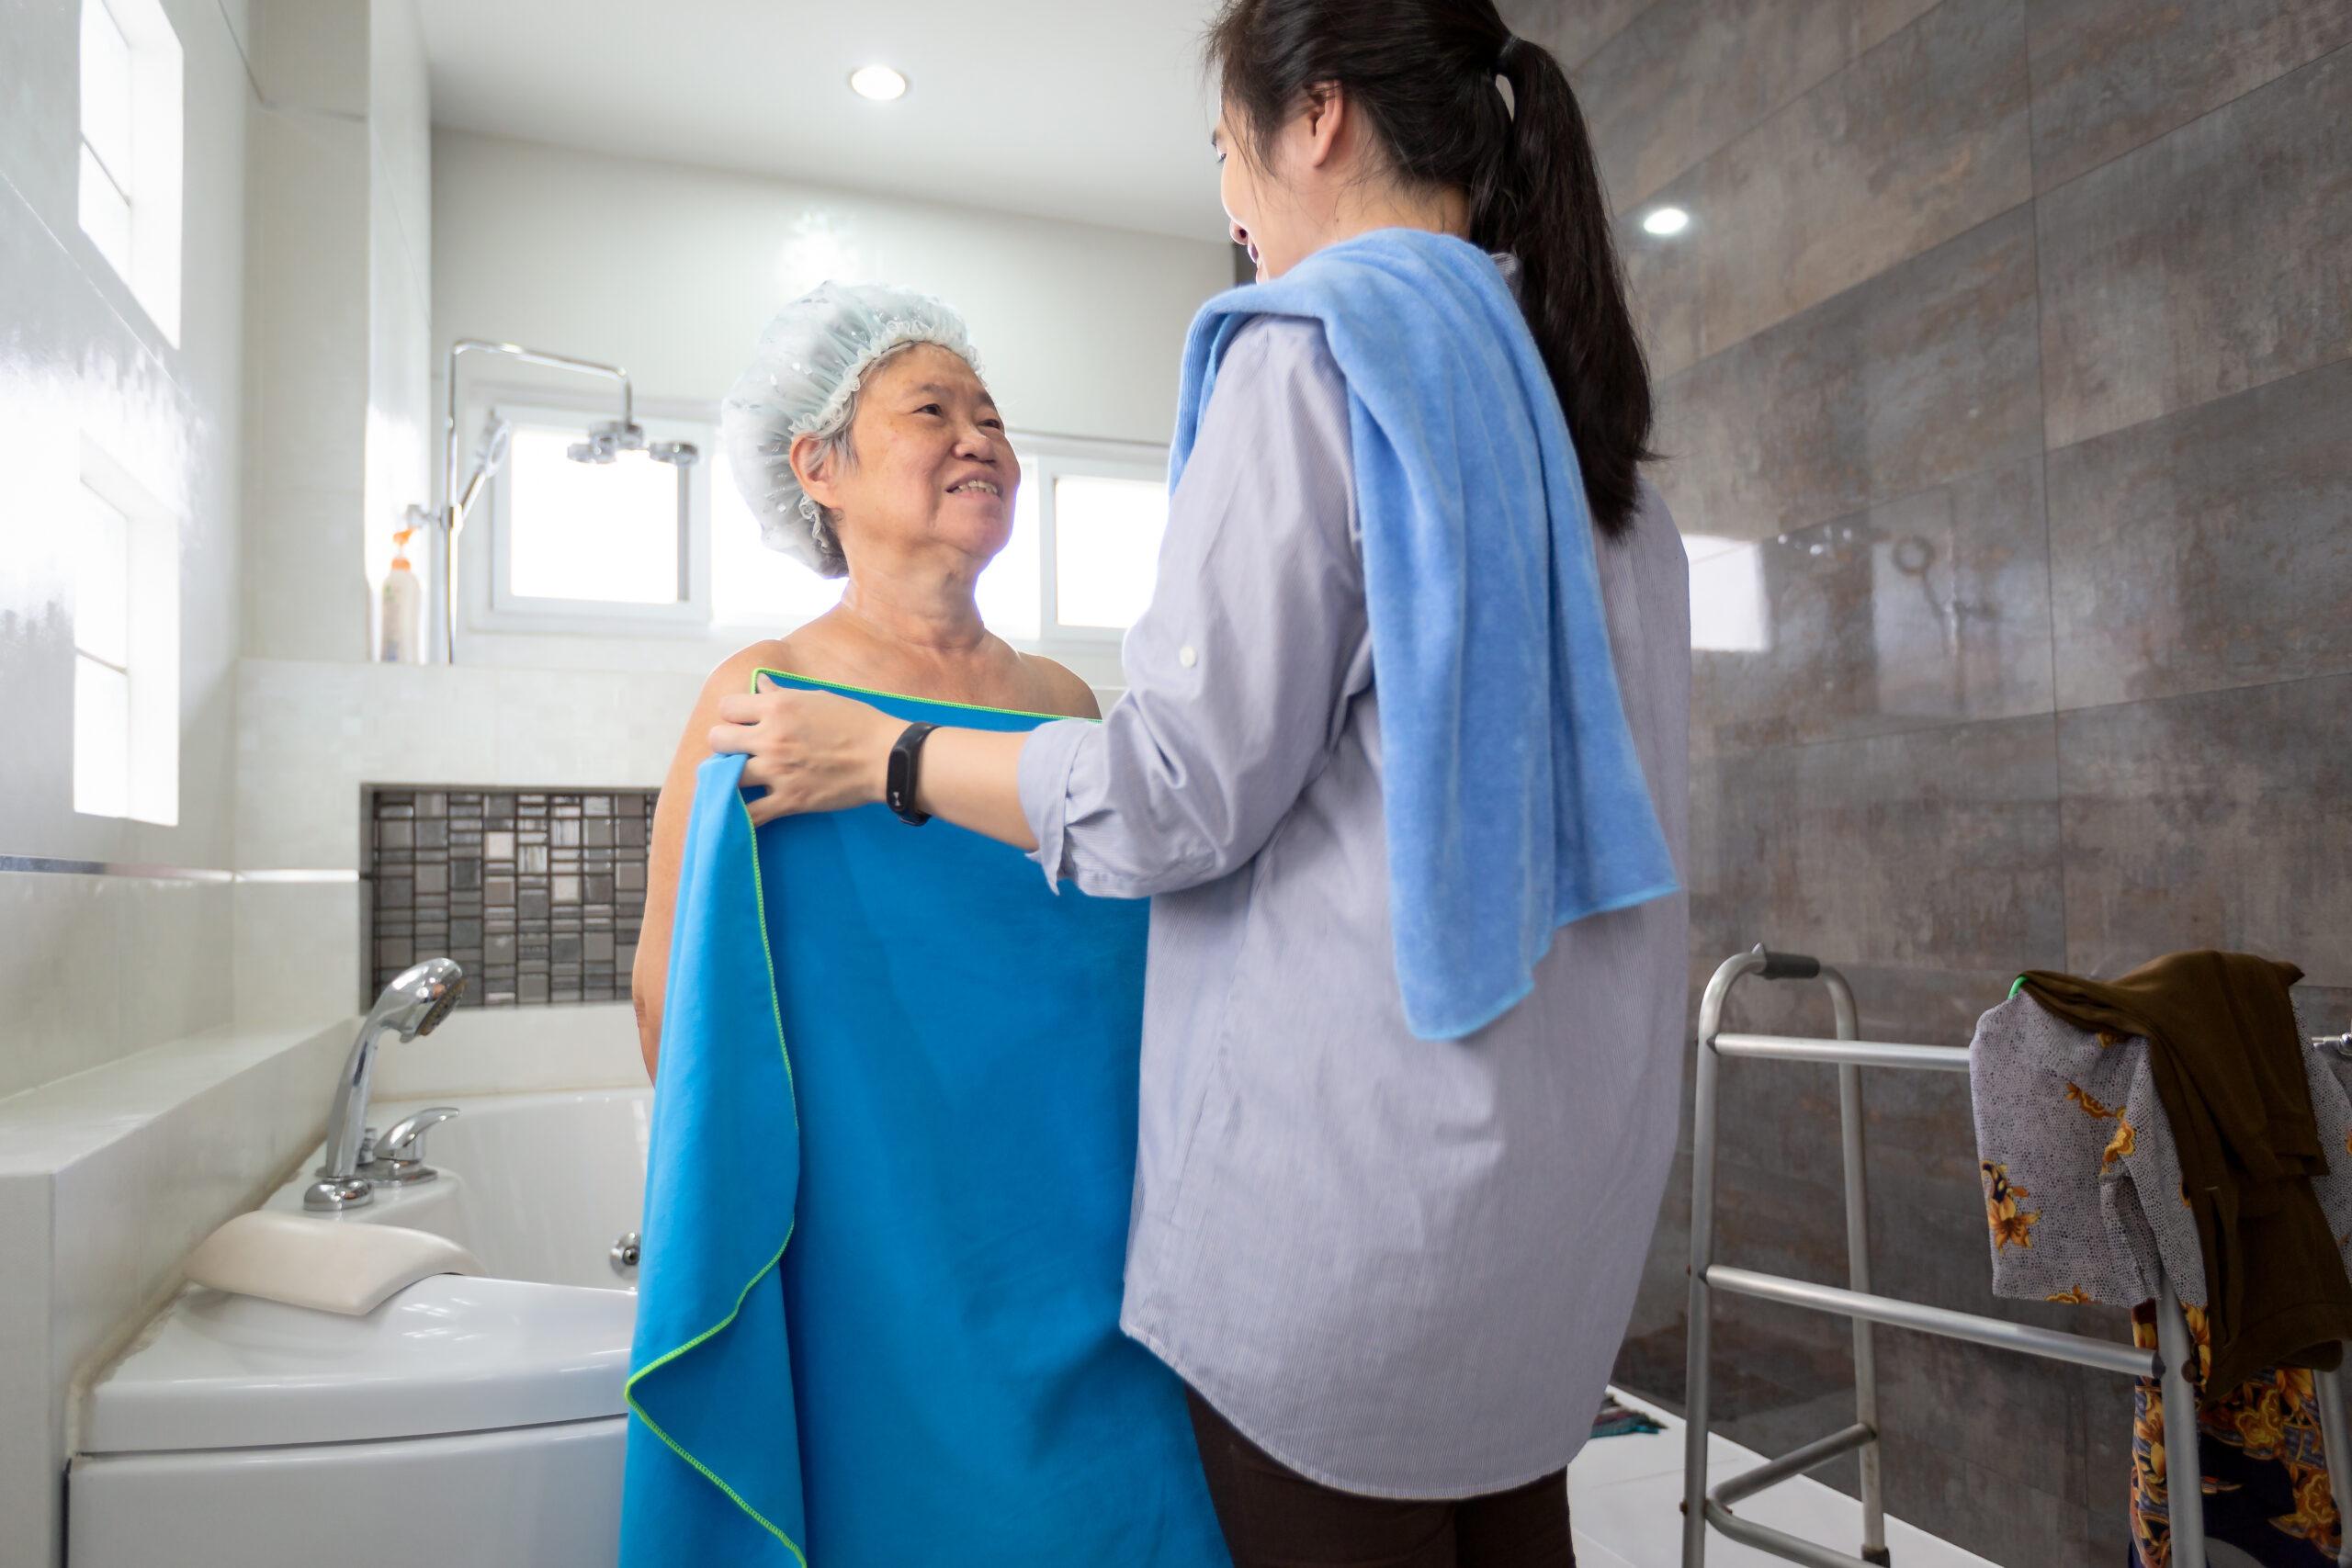 Adult Care Bath Tub (coming soon)